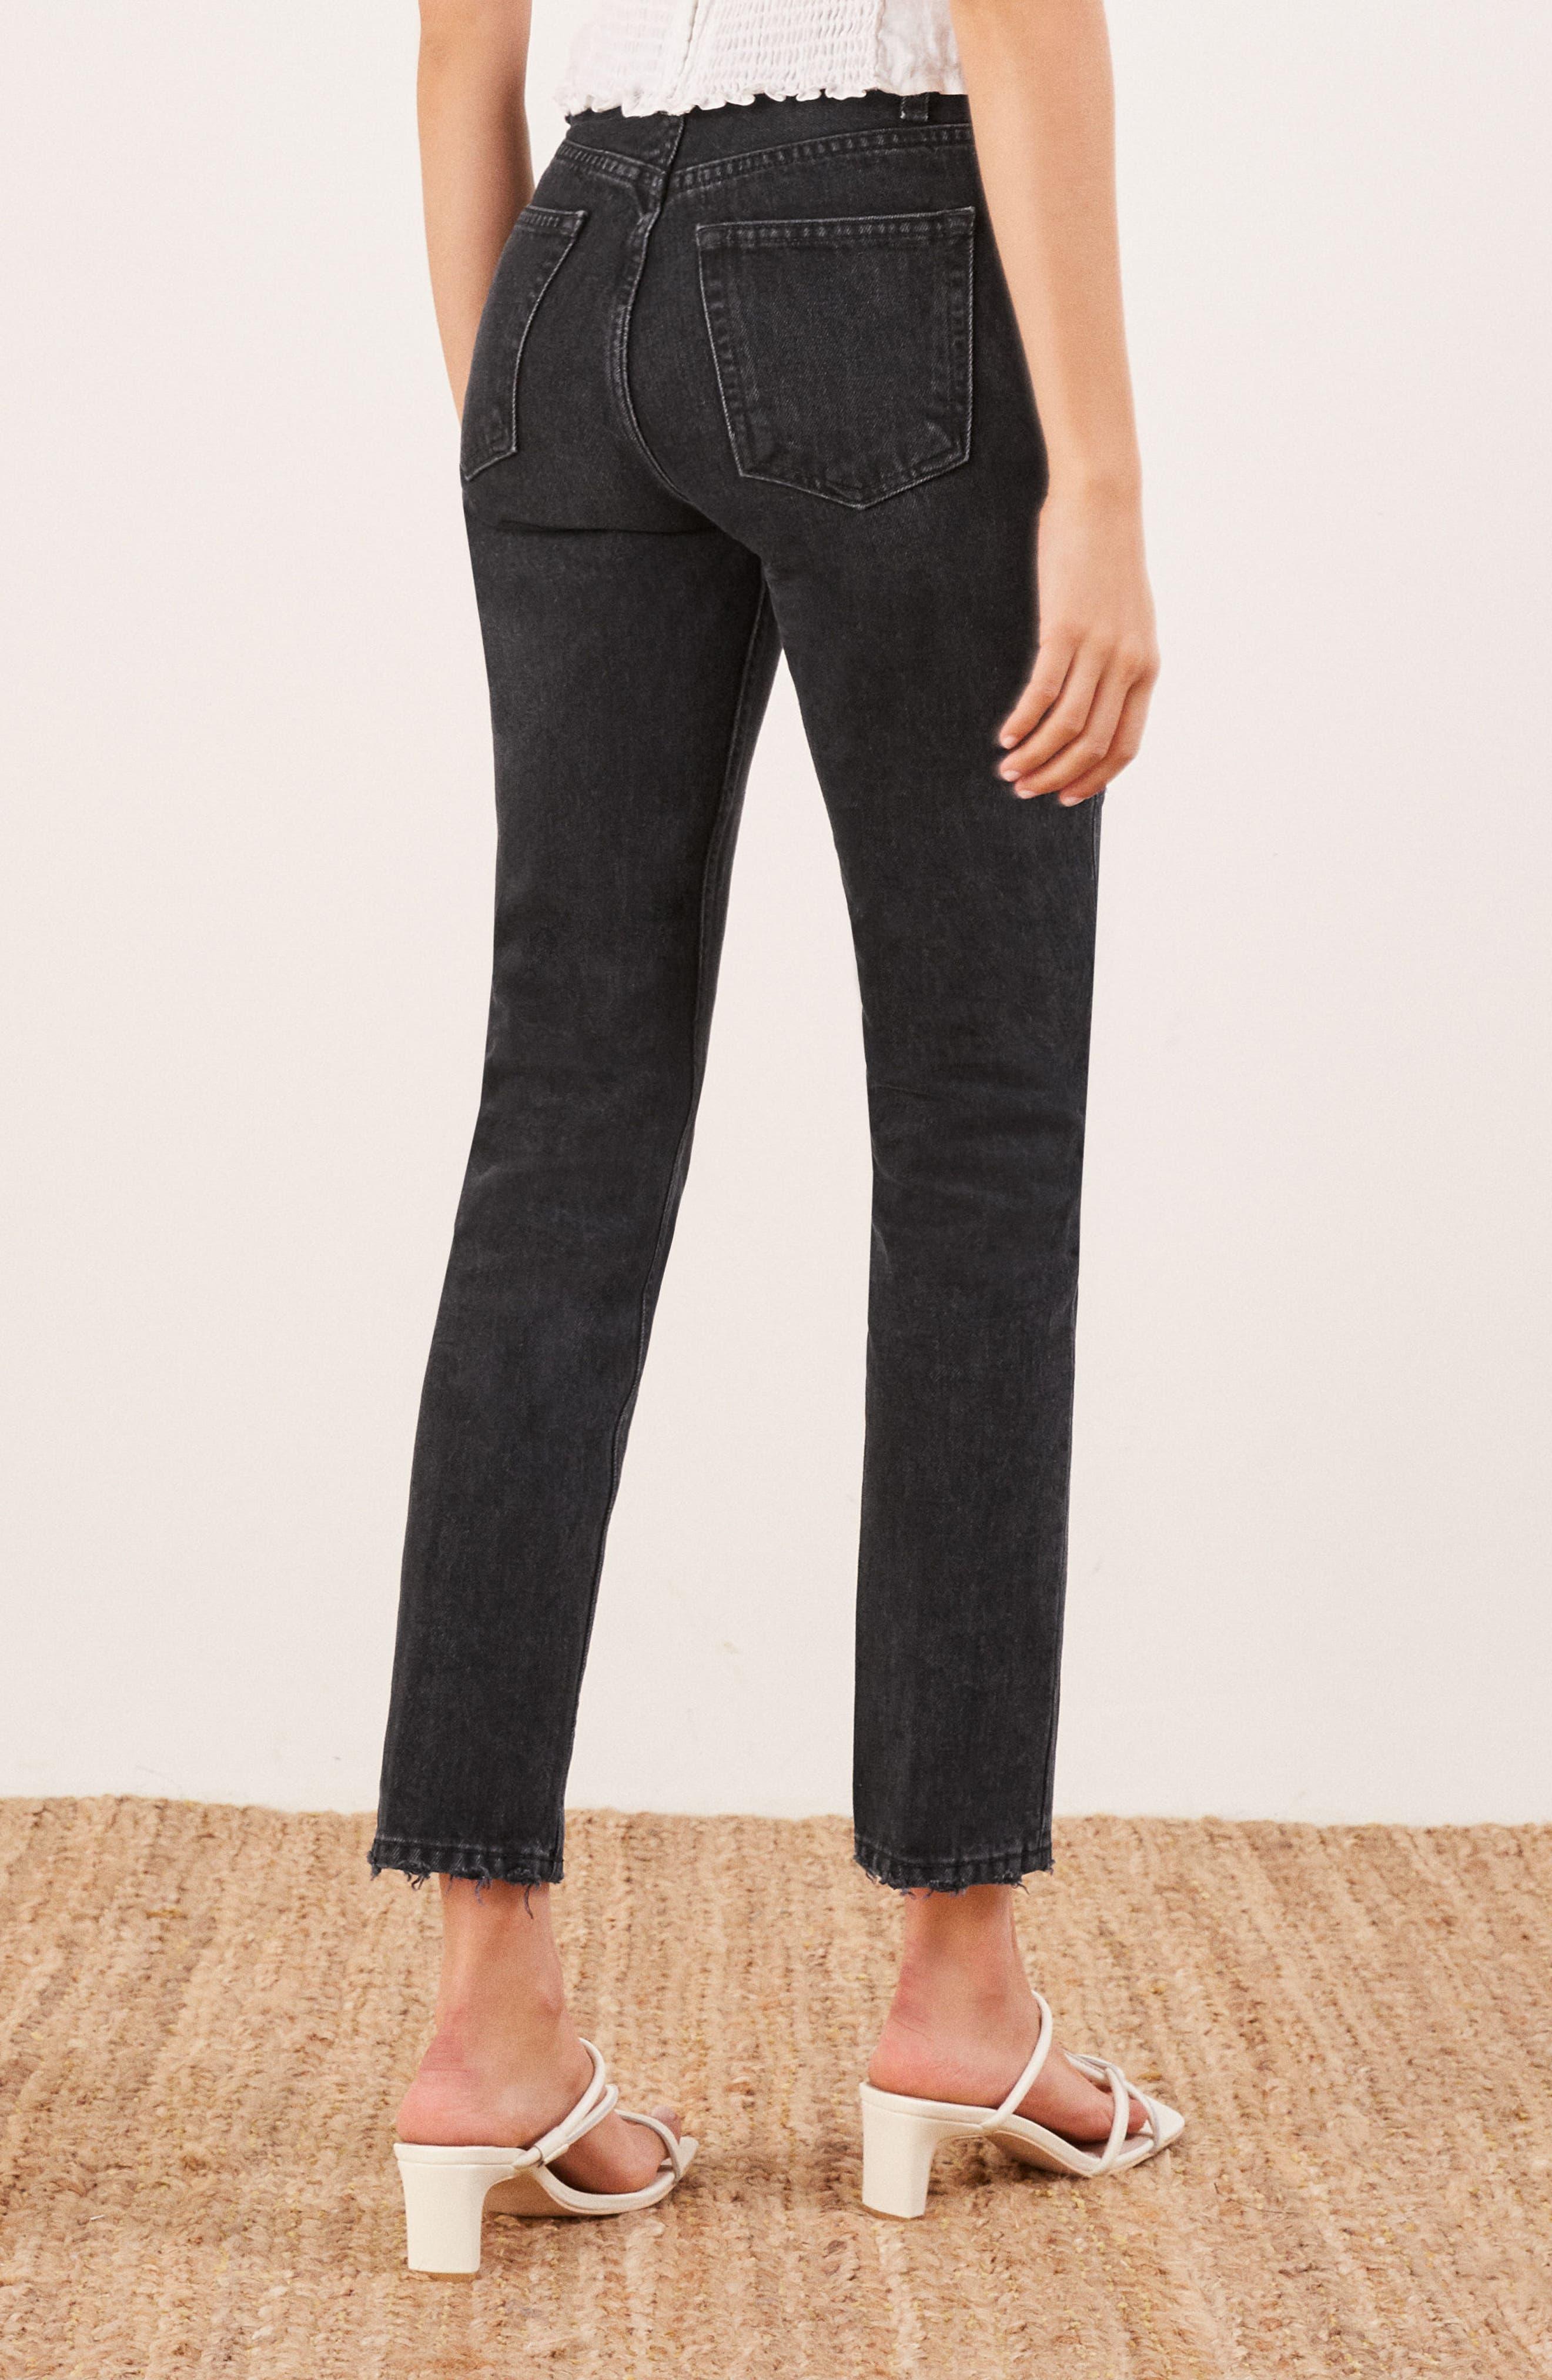 REFORMATION, Julia High Waist Cigarette Jeans, Alternate thumbnail 2, color, BLACK